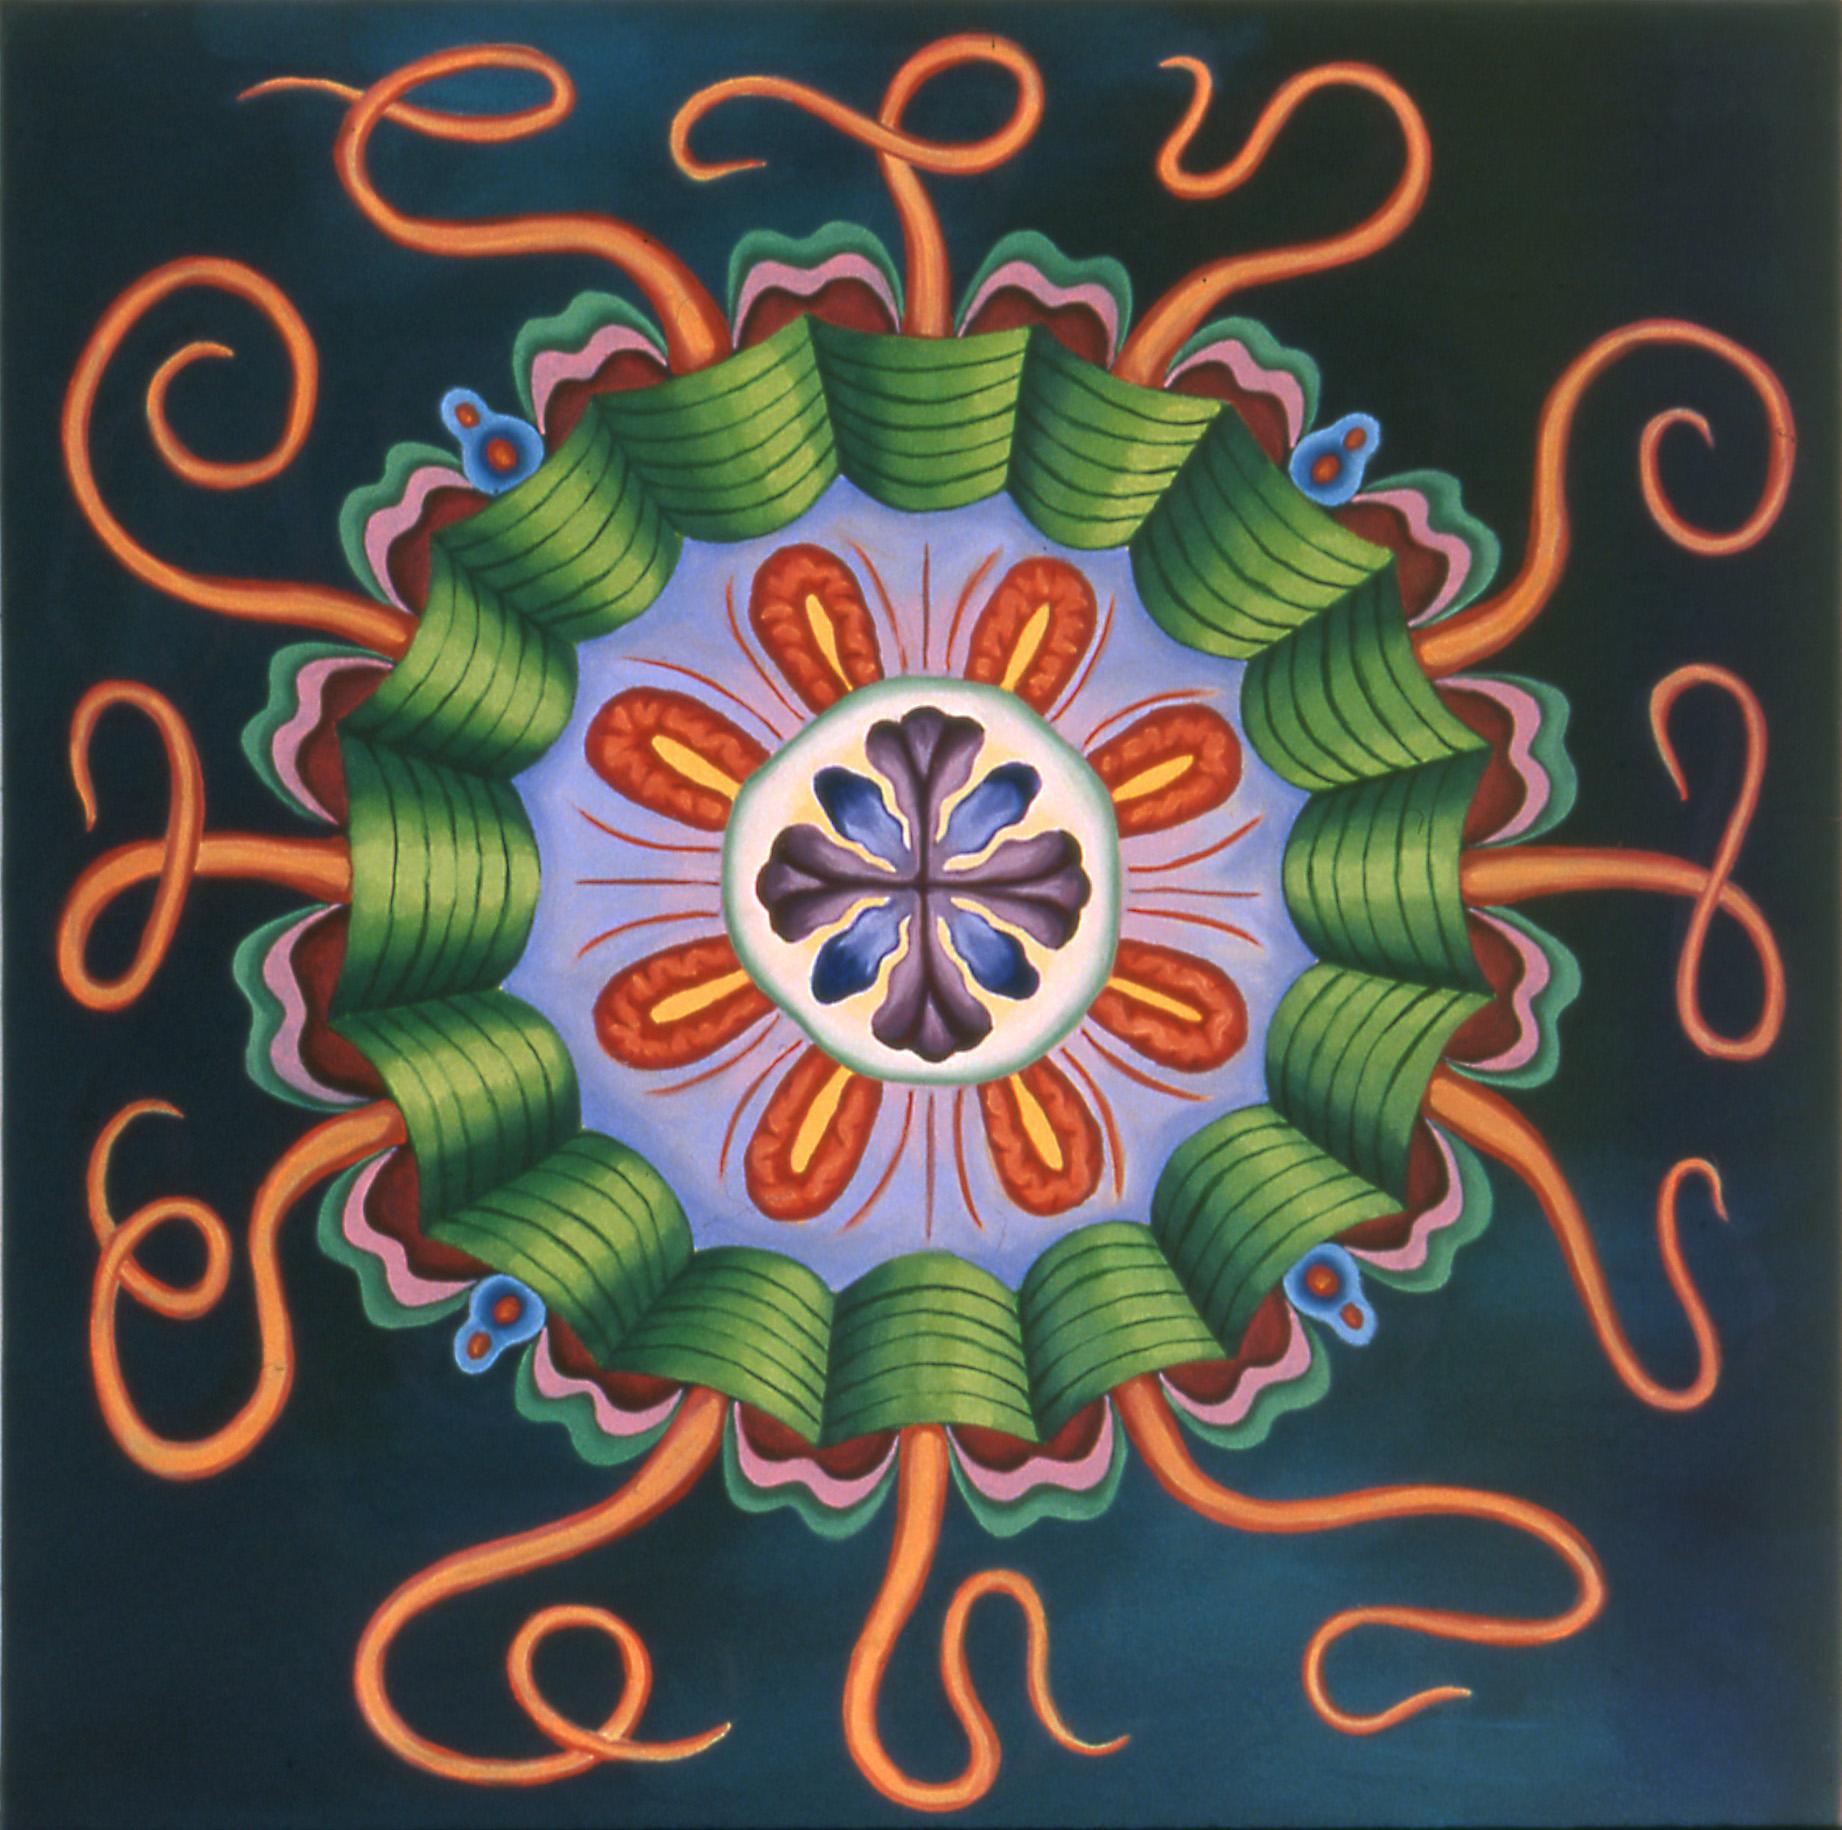 Teal Jellyfish, 2003